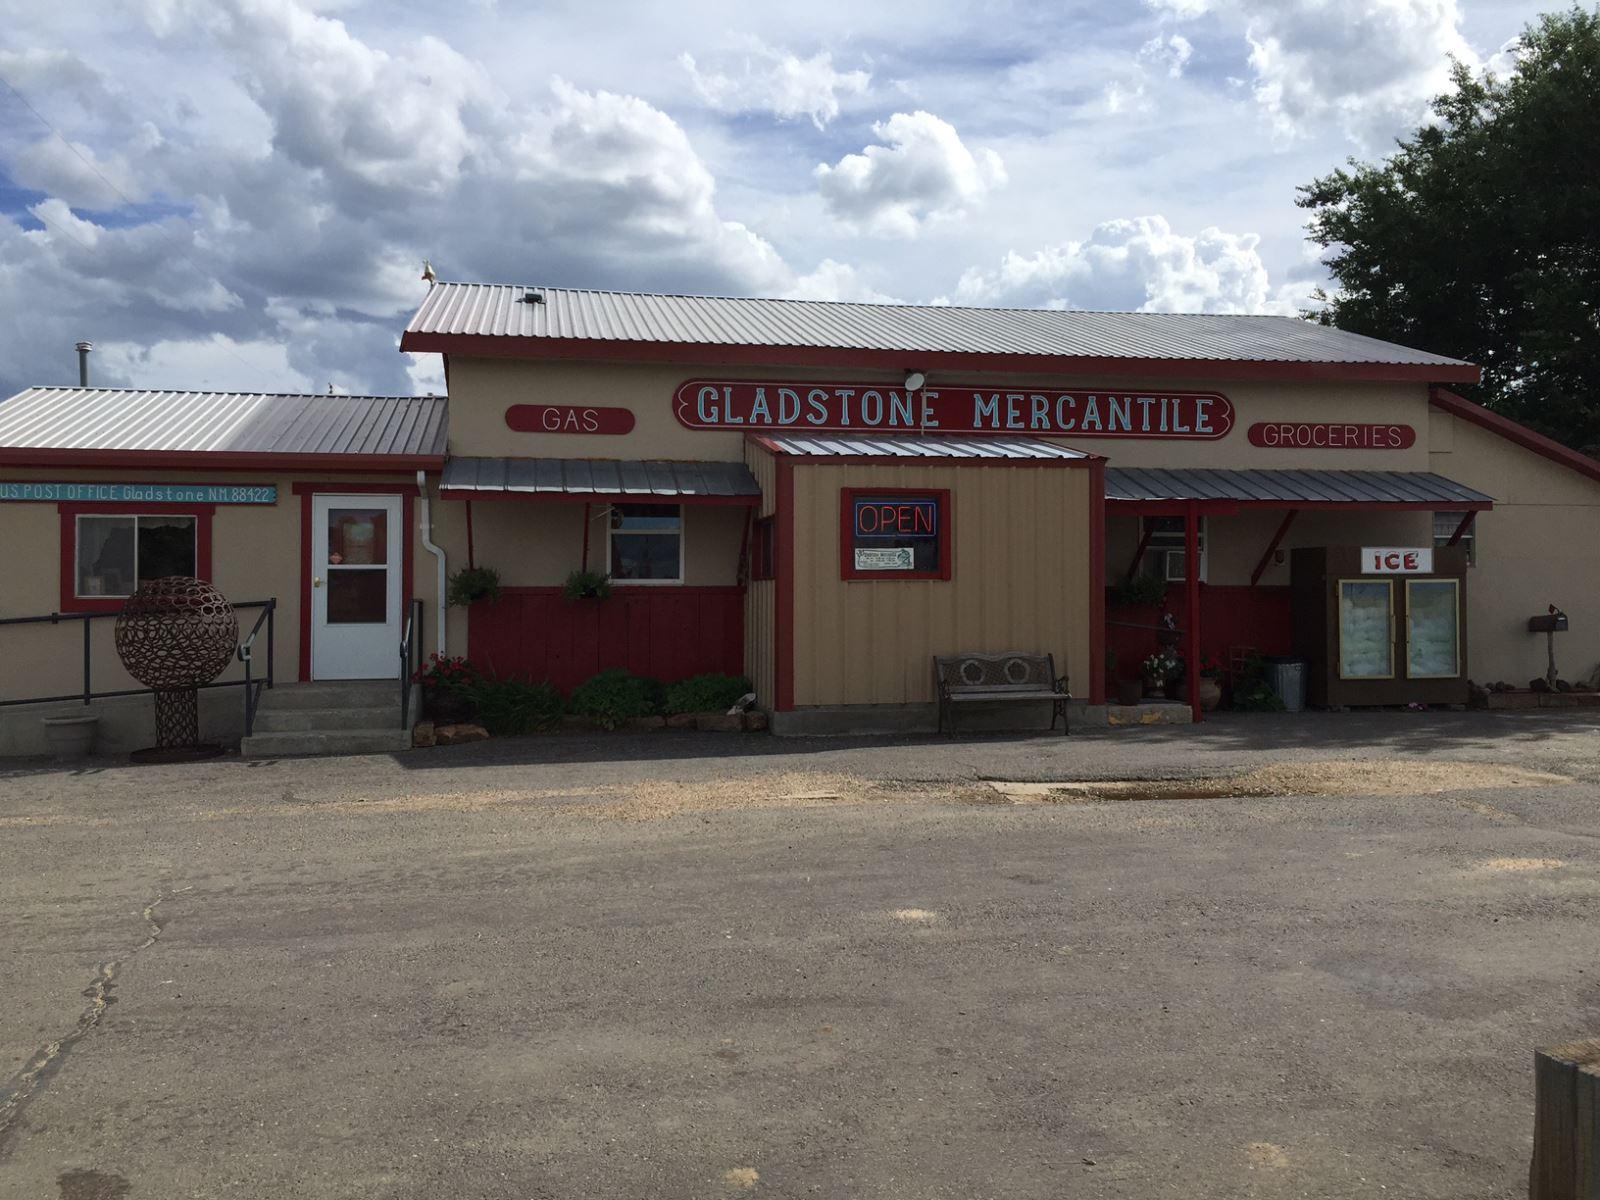 New mexico union county gladstone - Gladstone New Mexico Pop 15